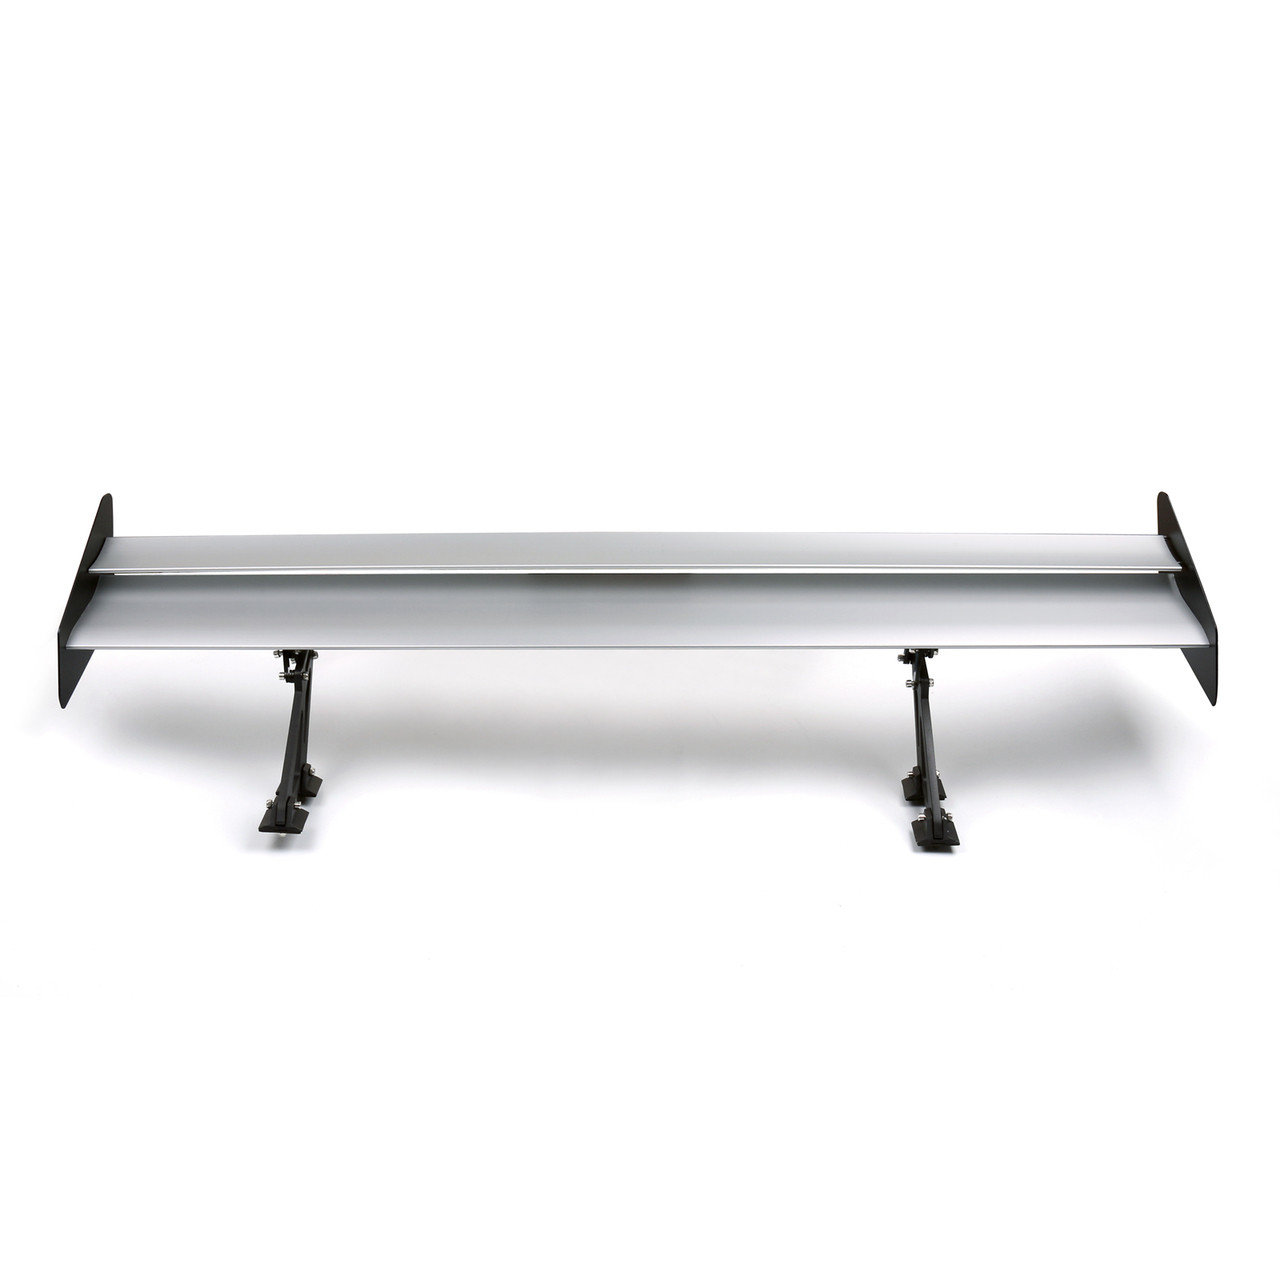 http://www.madhornets.store/AMZ/CarPart/Wing%20Spoiler/C102/C102-017-Silver-2.jpg